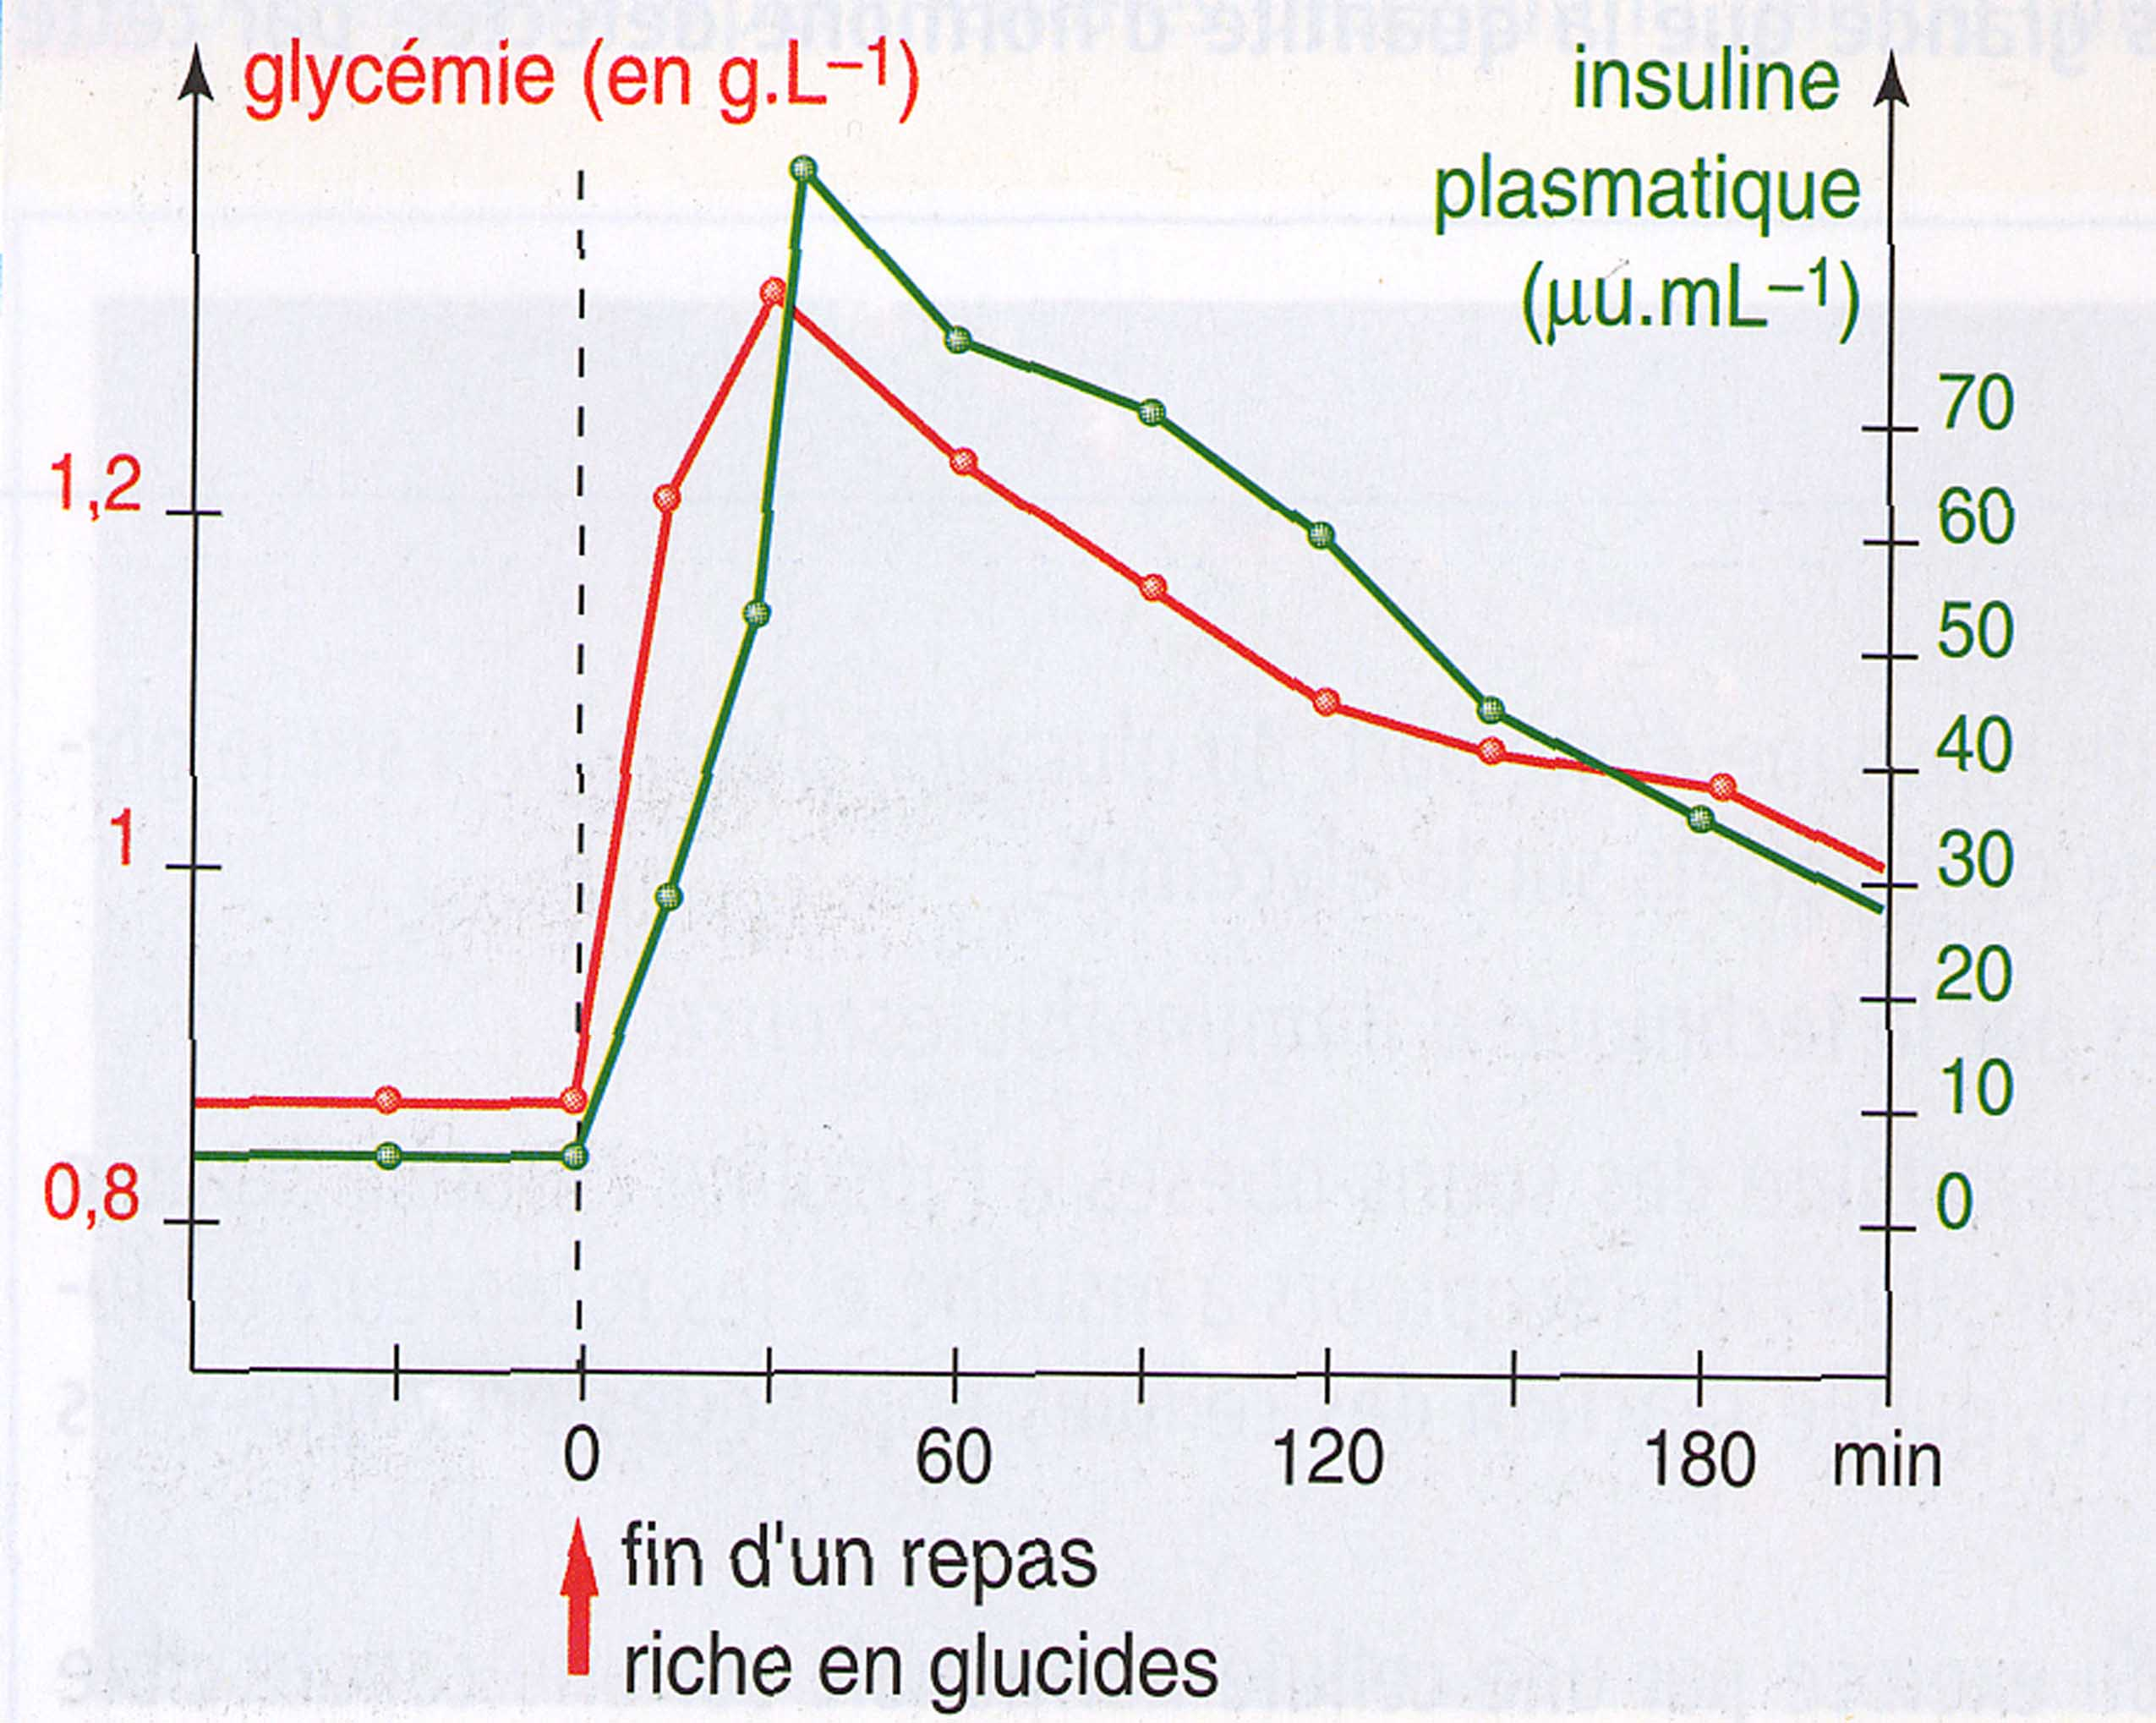 Insuline post-prandial